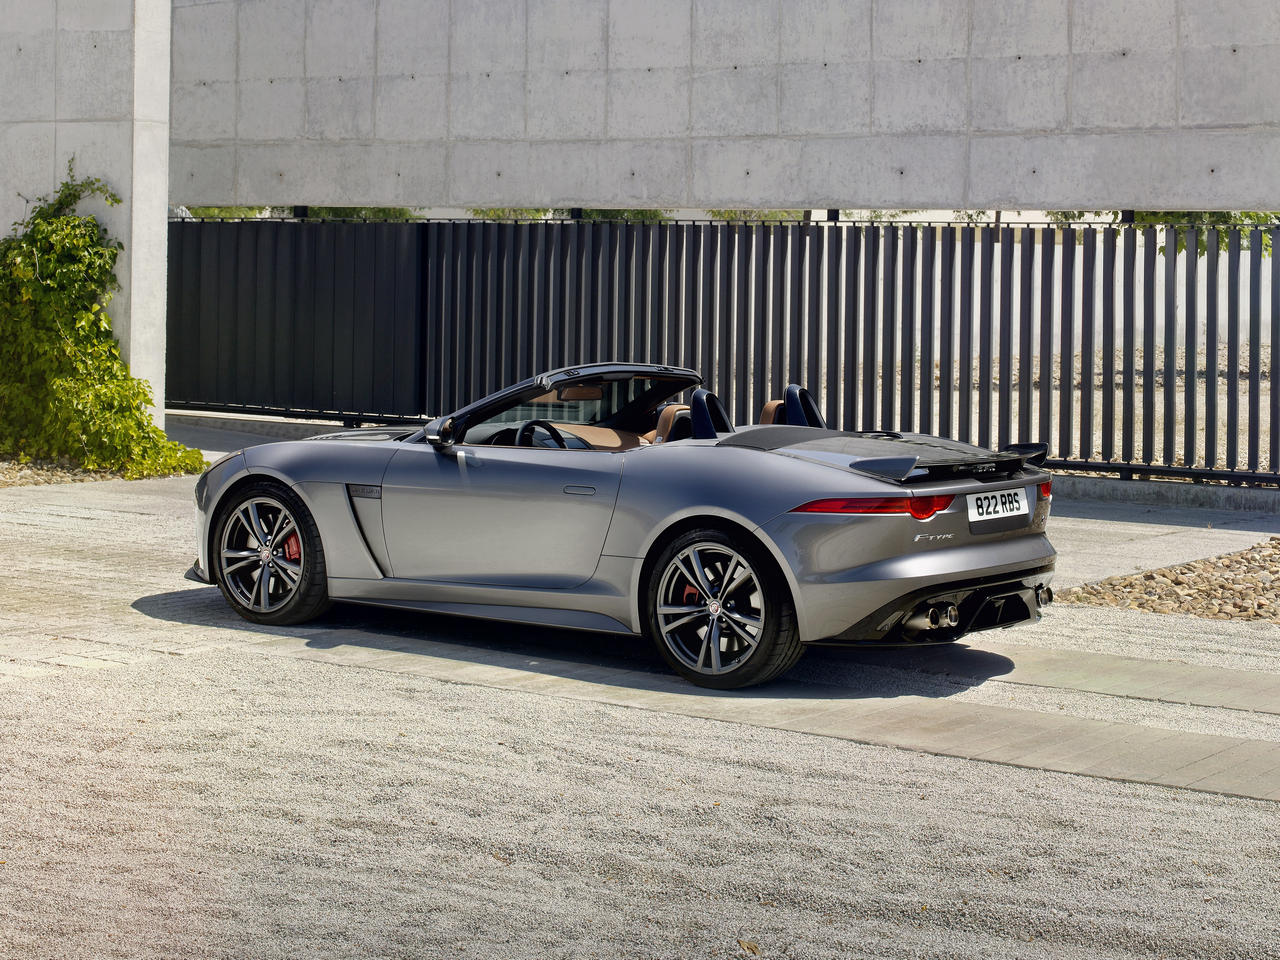 jaguar-f-type-convertible-SVR-geneva-2016_0-100_1